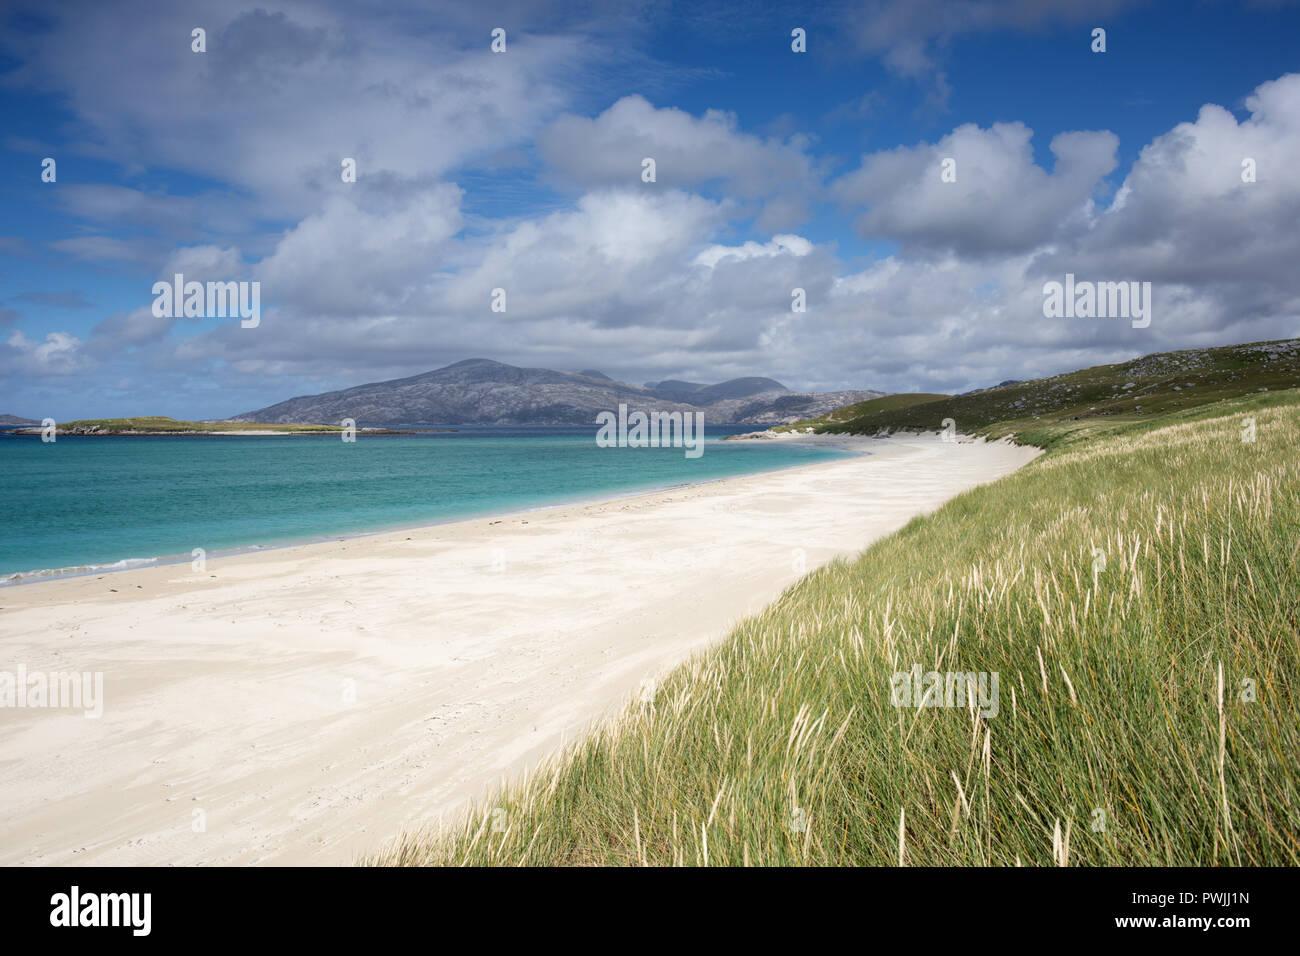 Traigh Mheilein, Huisinis, Outer Hebrides, Scotland, UK - Stock Image